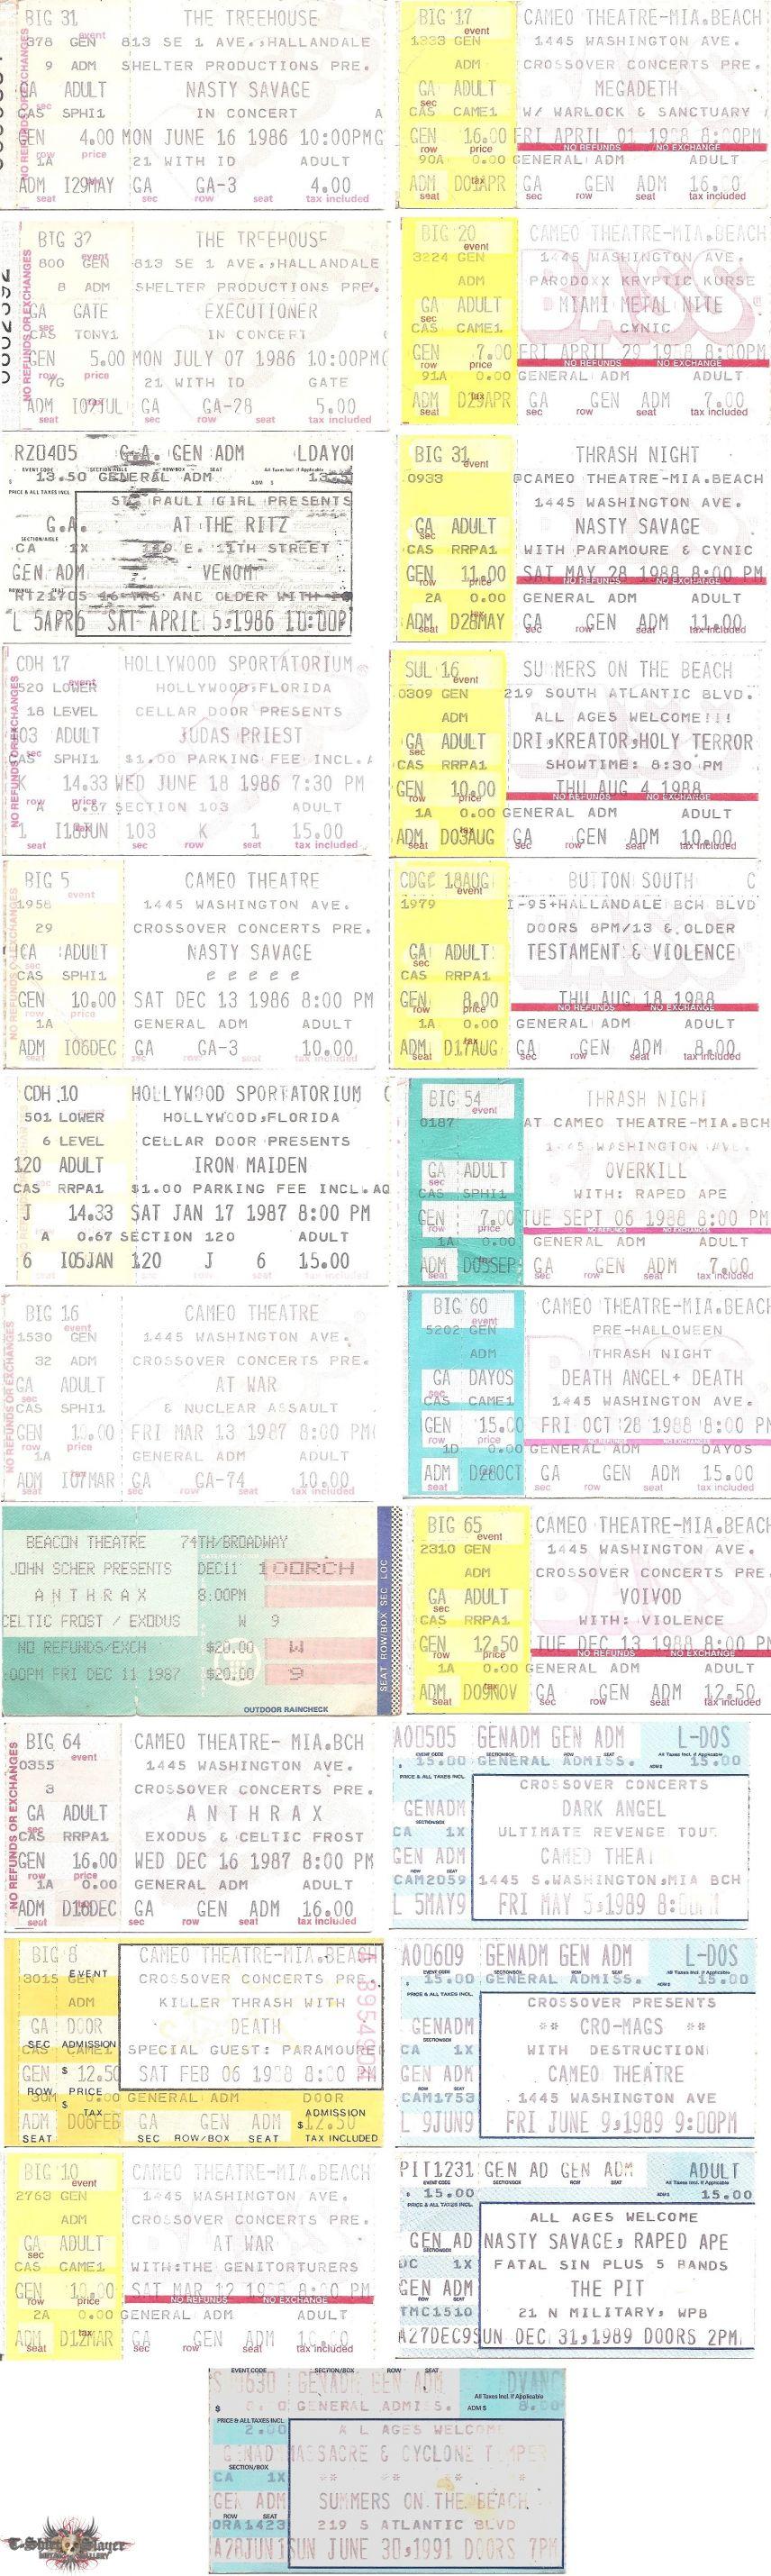 Various Artists - Ticket Stubs (1986 - 1991)